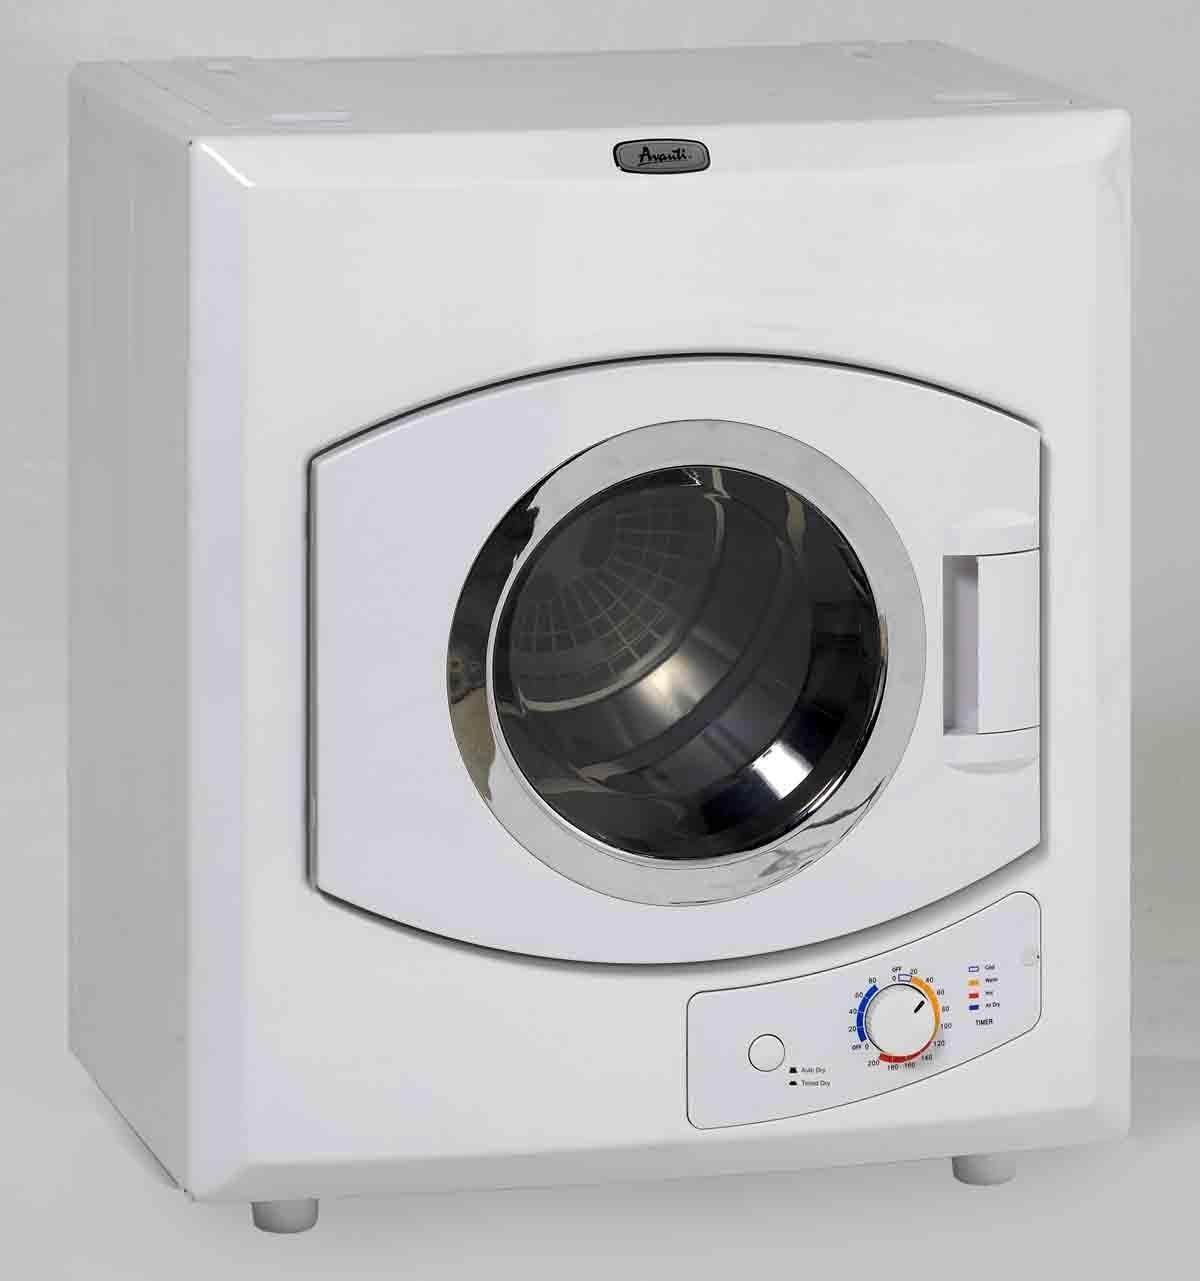 Avanti Automatic Dryer